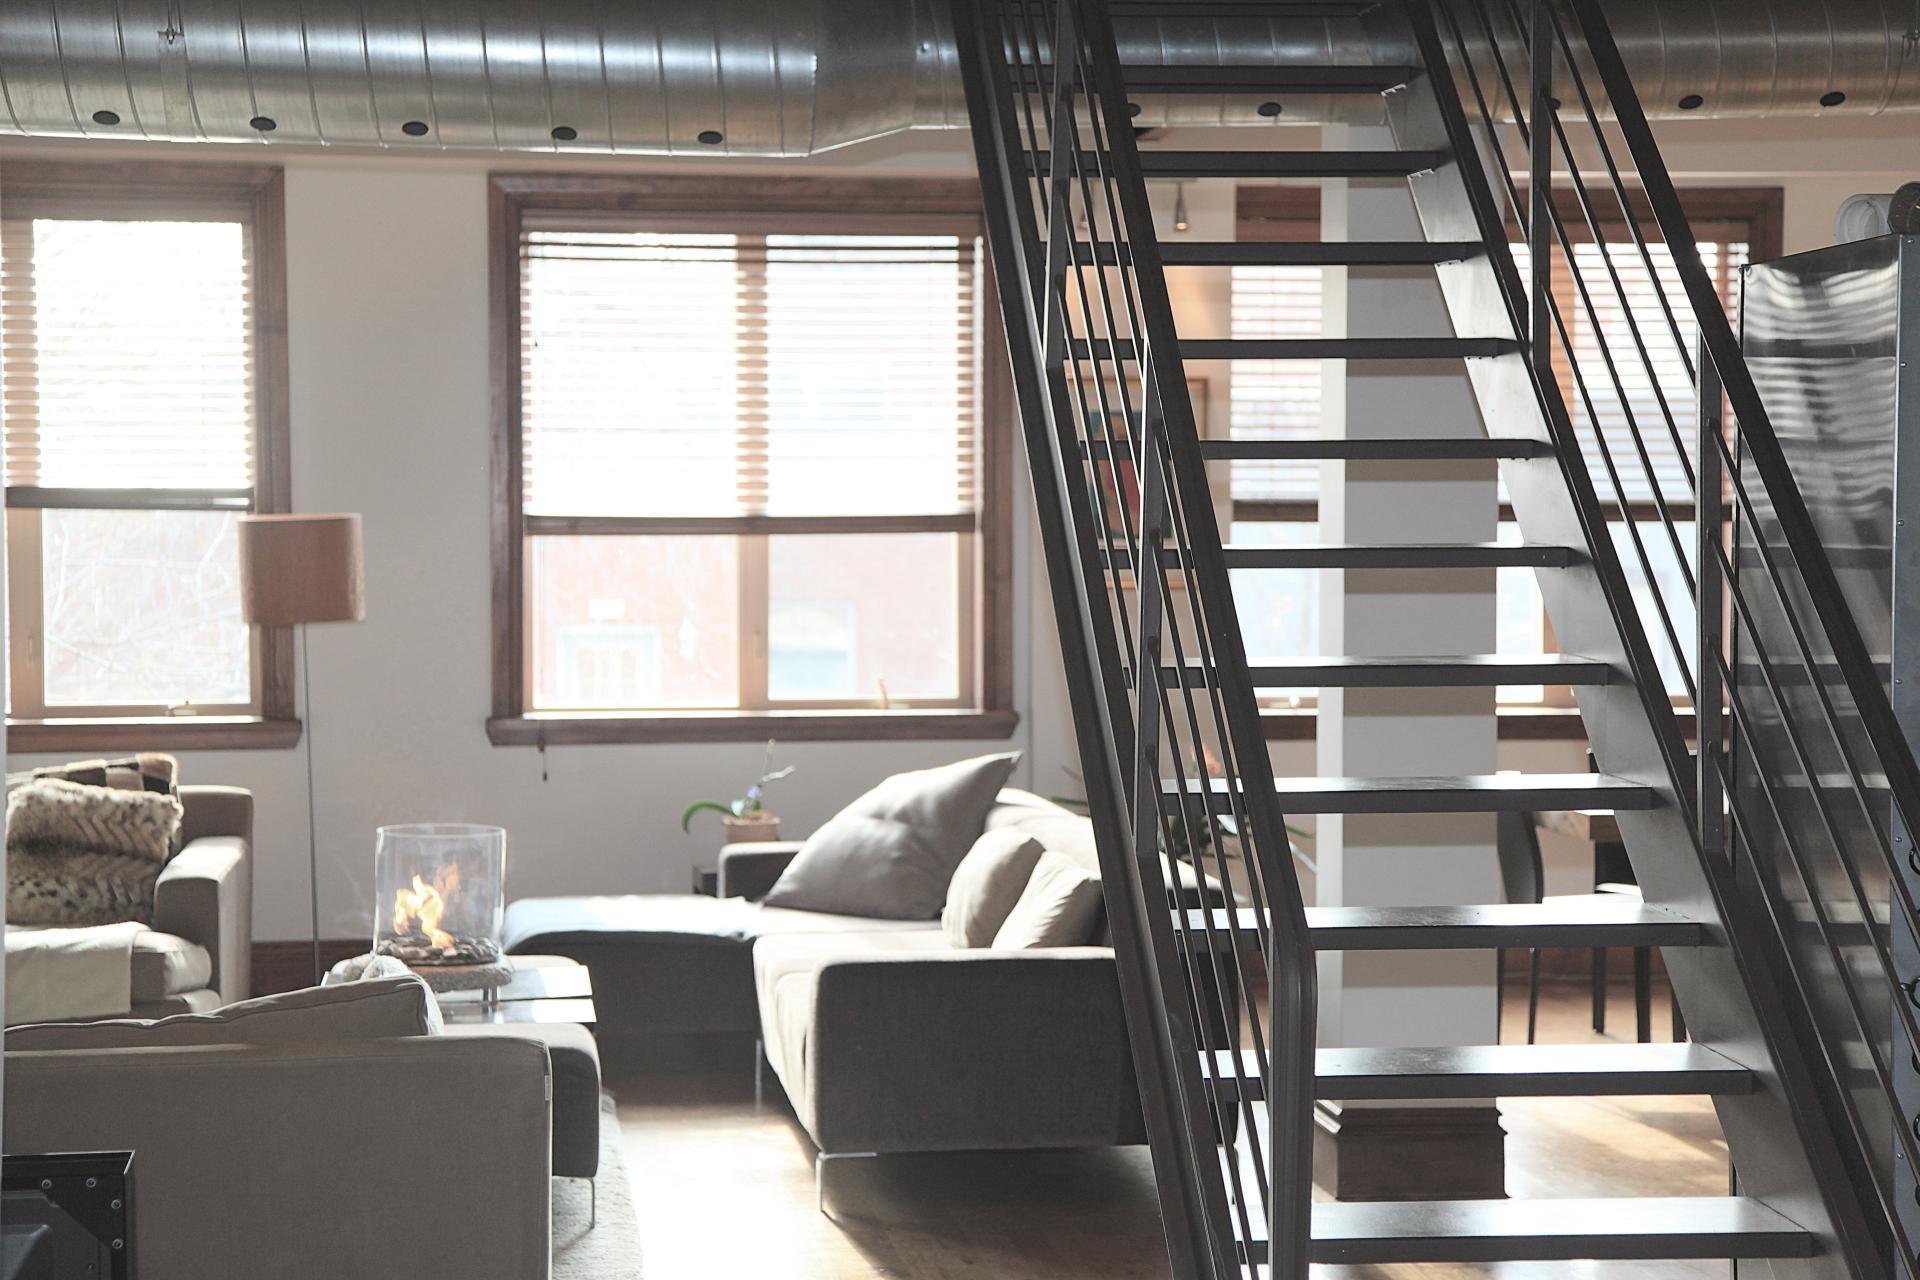 Two storey modern flat